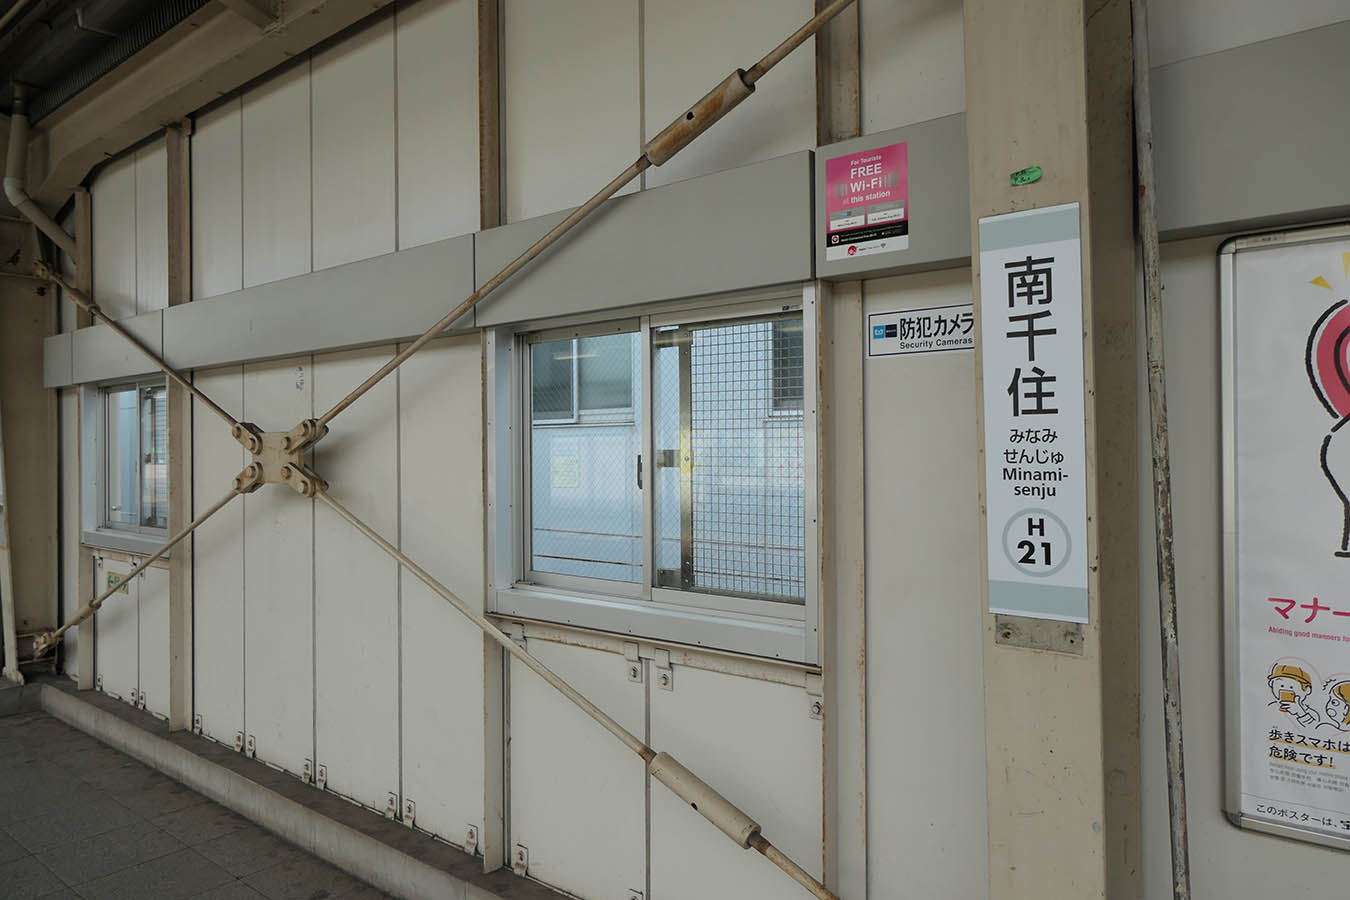 H21_photo01.jpg